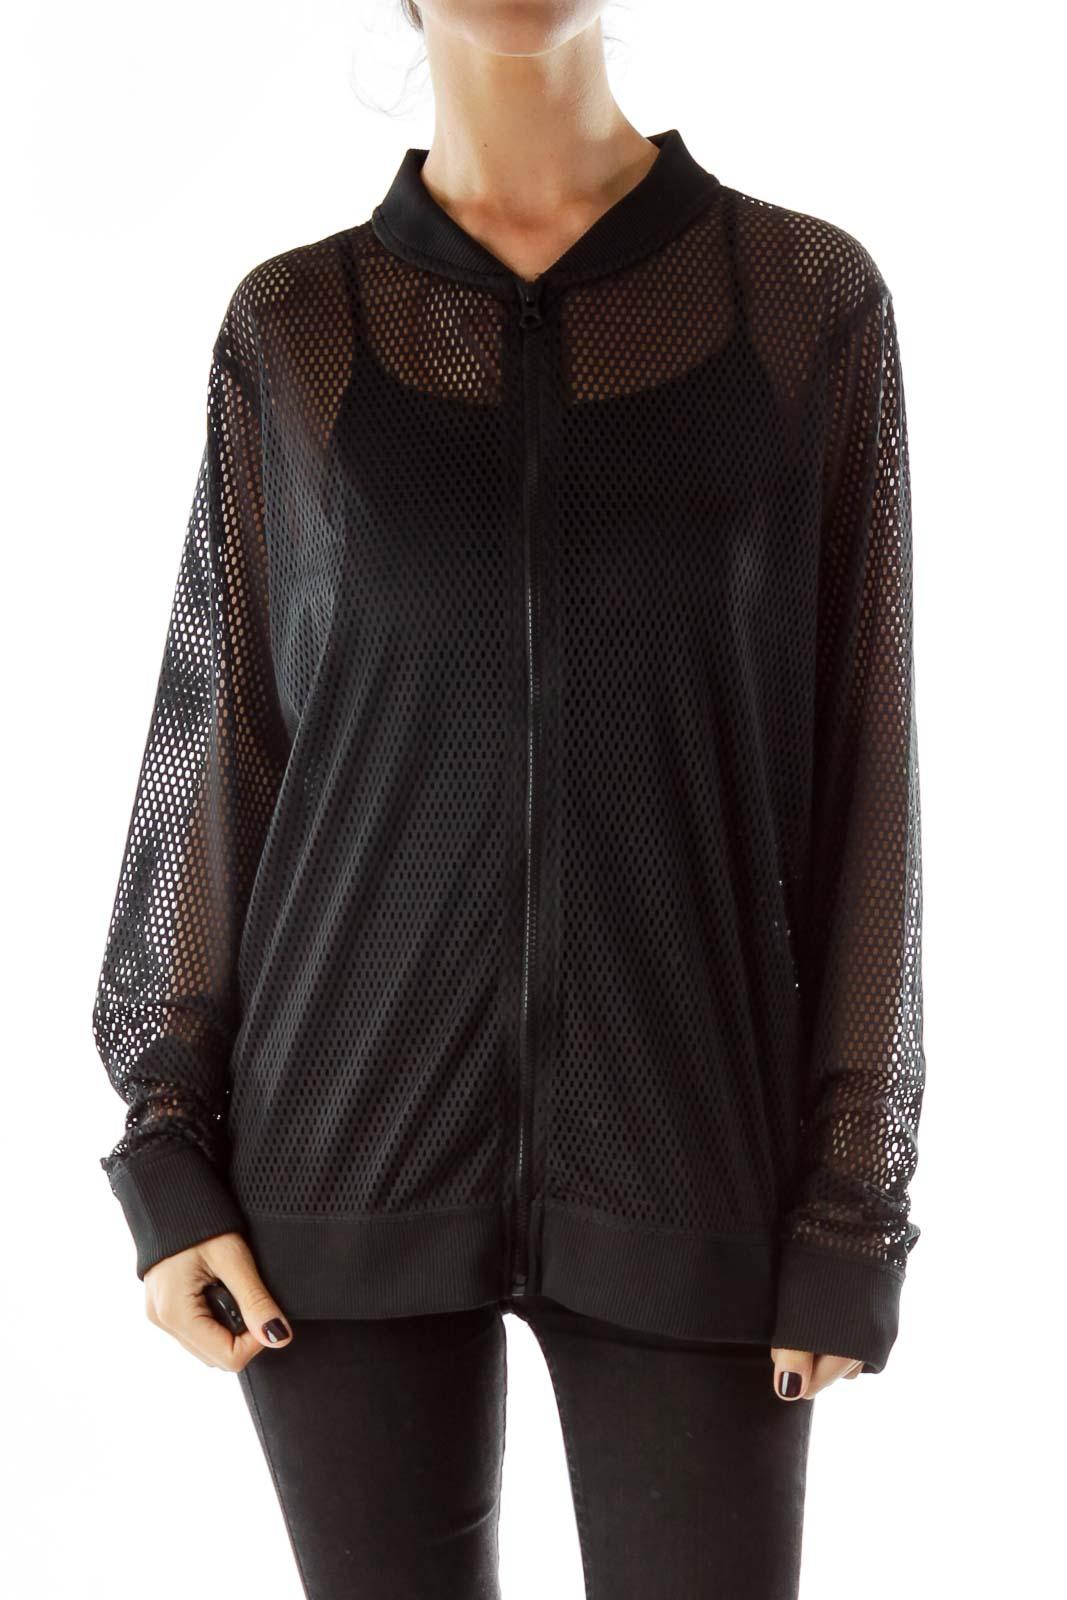 Black Mesh Sports Jacket